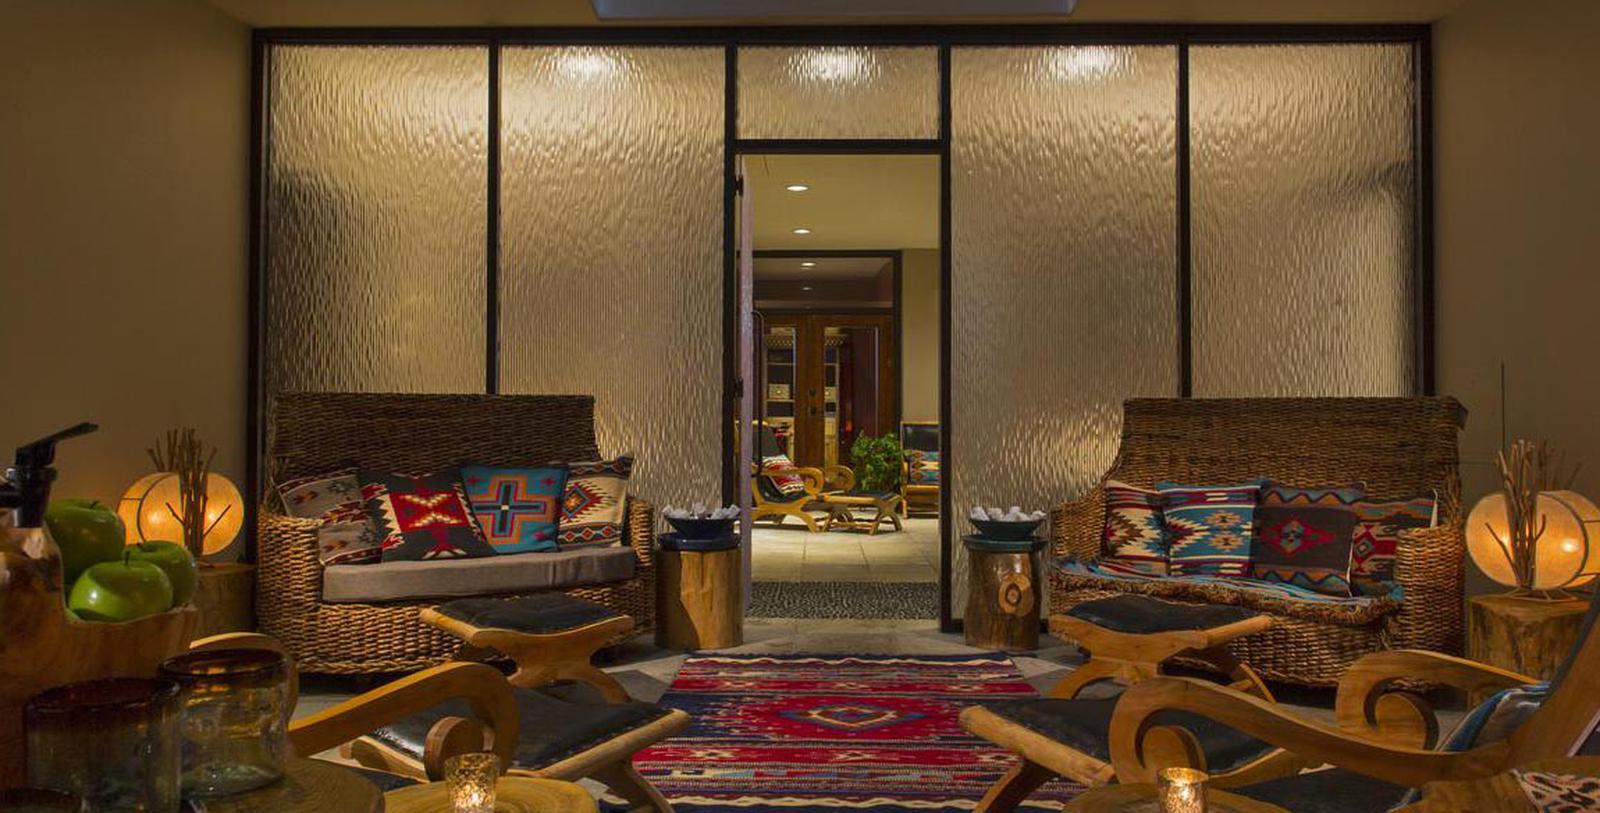 Image of Spa Lounge at La Posada de Santa Fe, A Tribute Portfolio Resort & Spa, 1882, Member of Historic Hotels of America, Santa Fe, New Mexico, Hot Deals